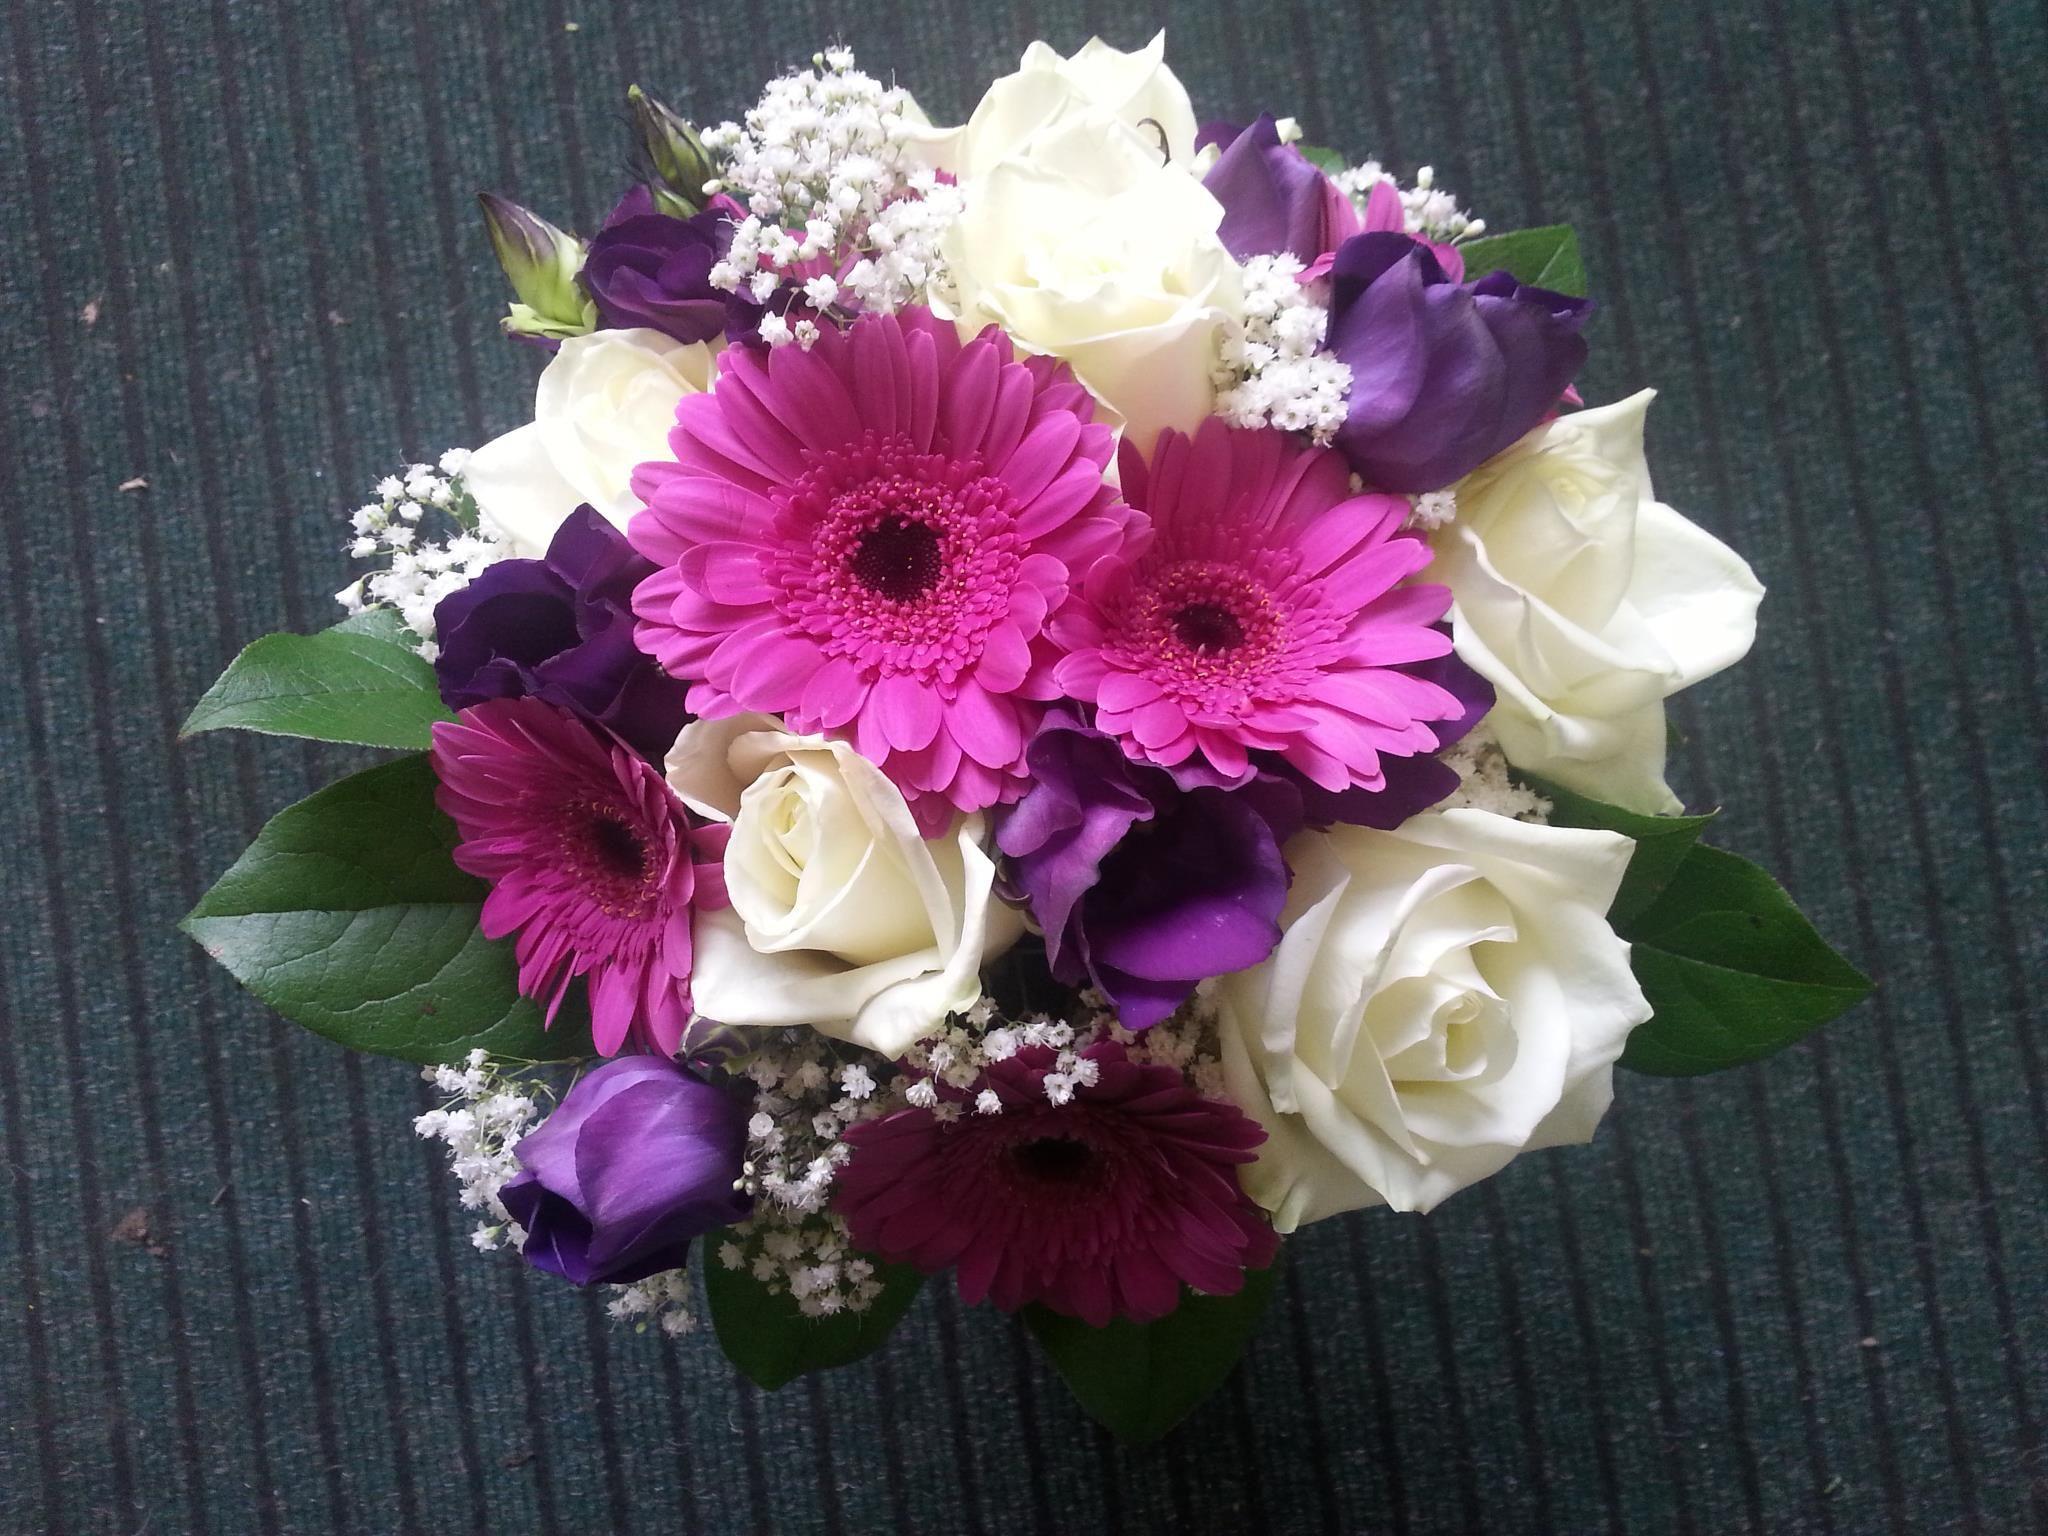 Mixed Bouquet Including Purple Lisianthus Gerberas Gypsophila And